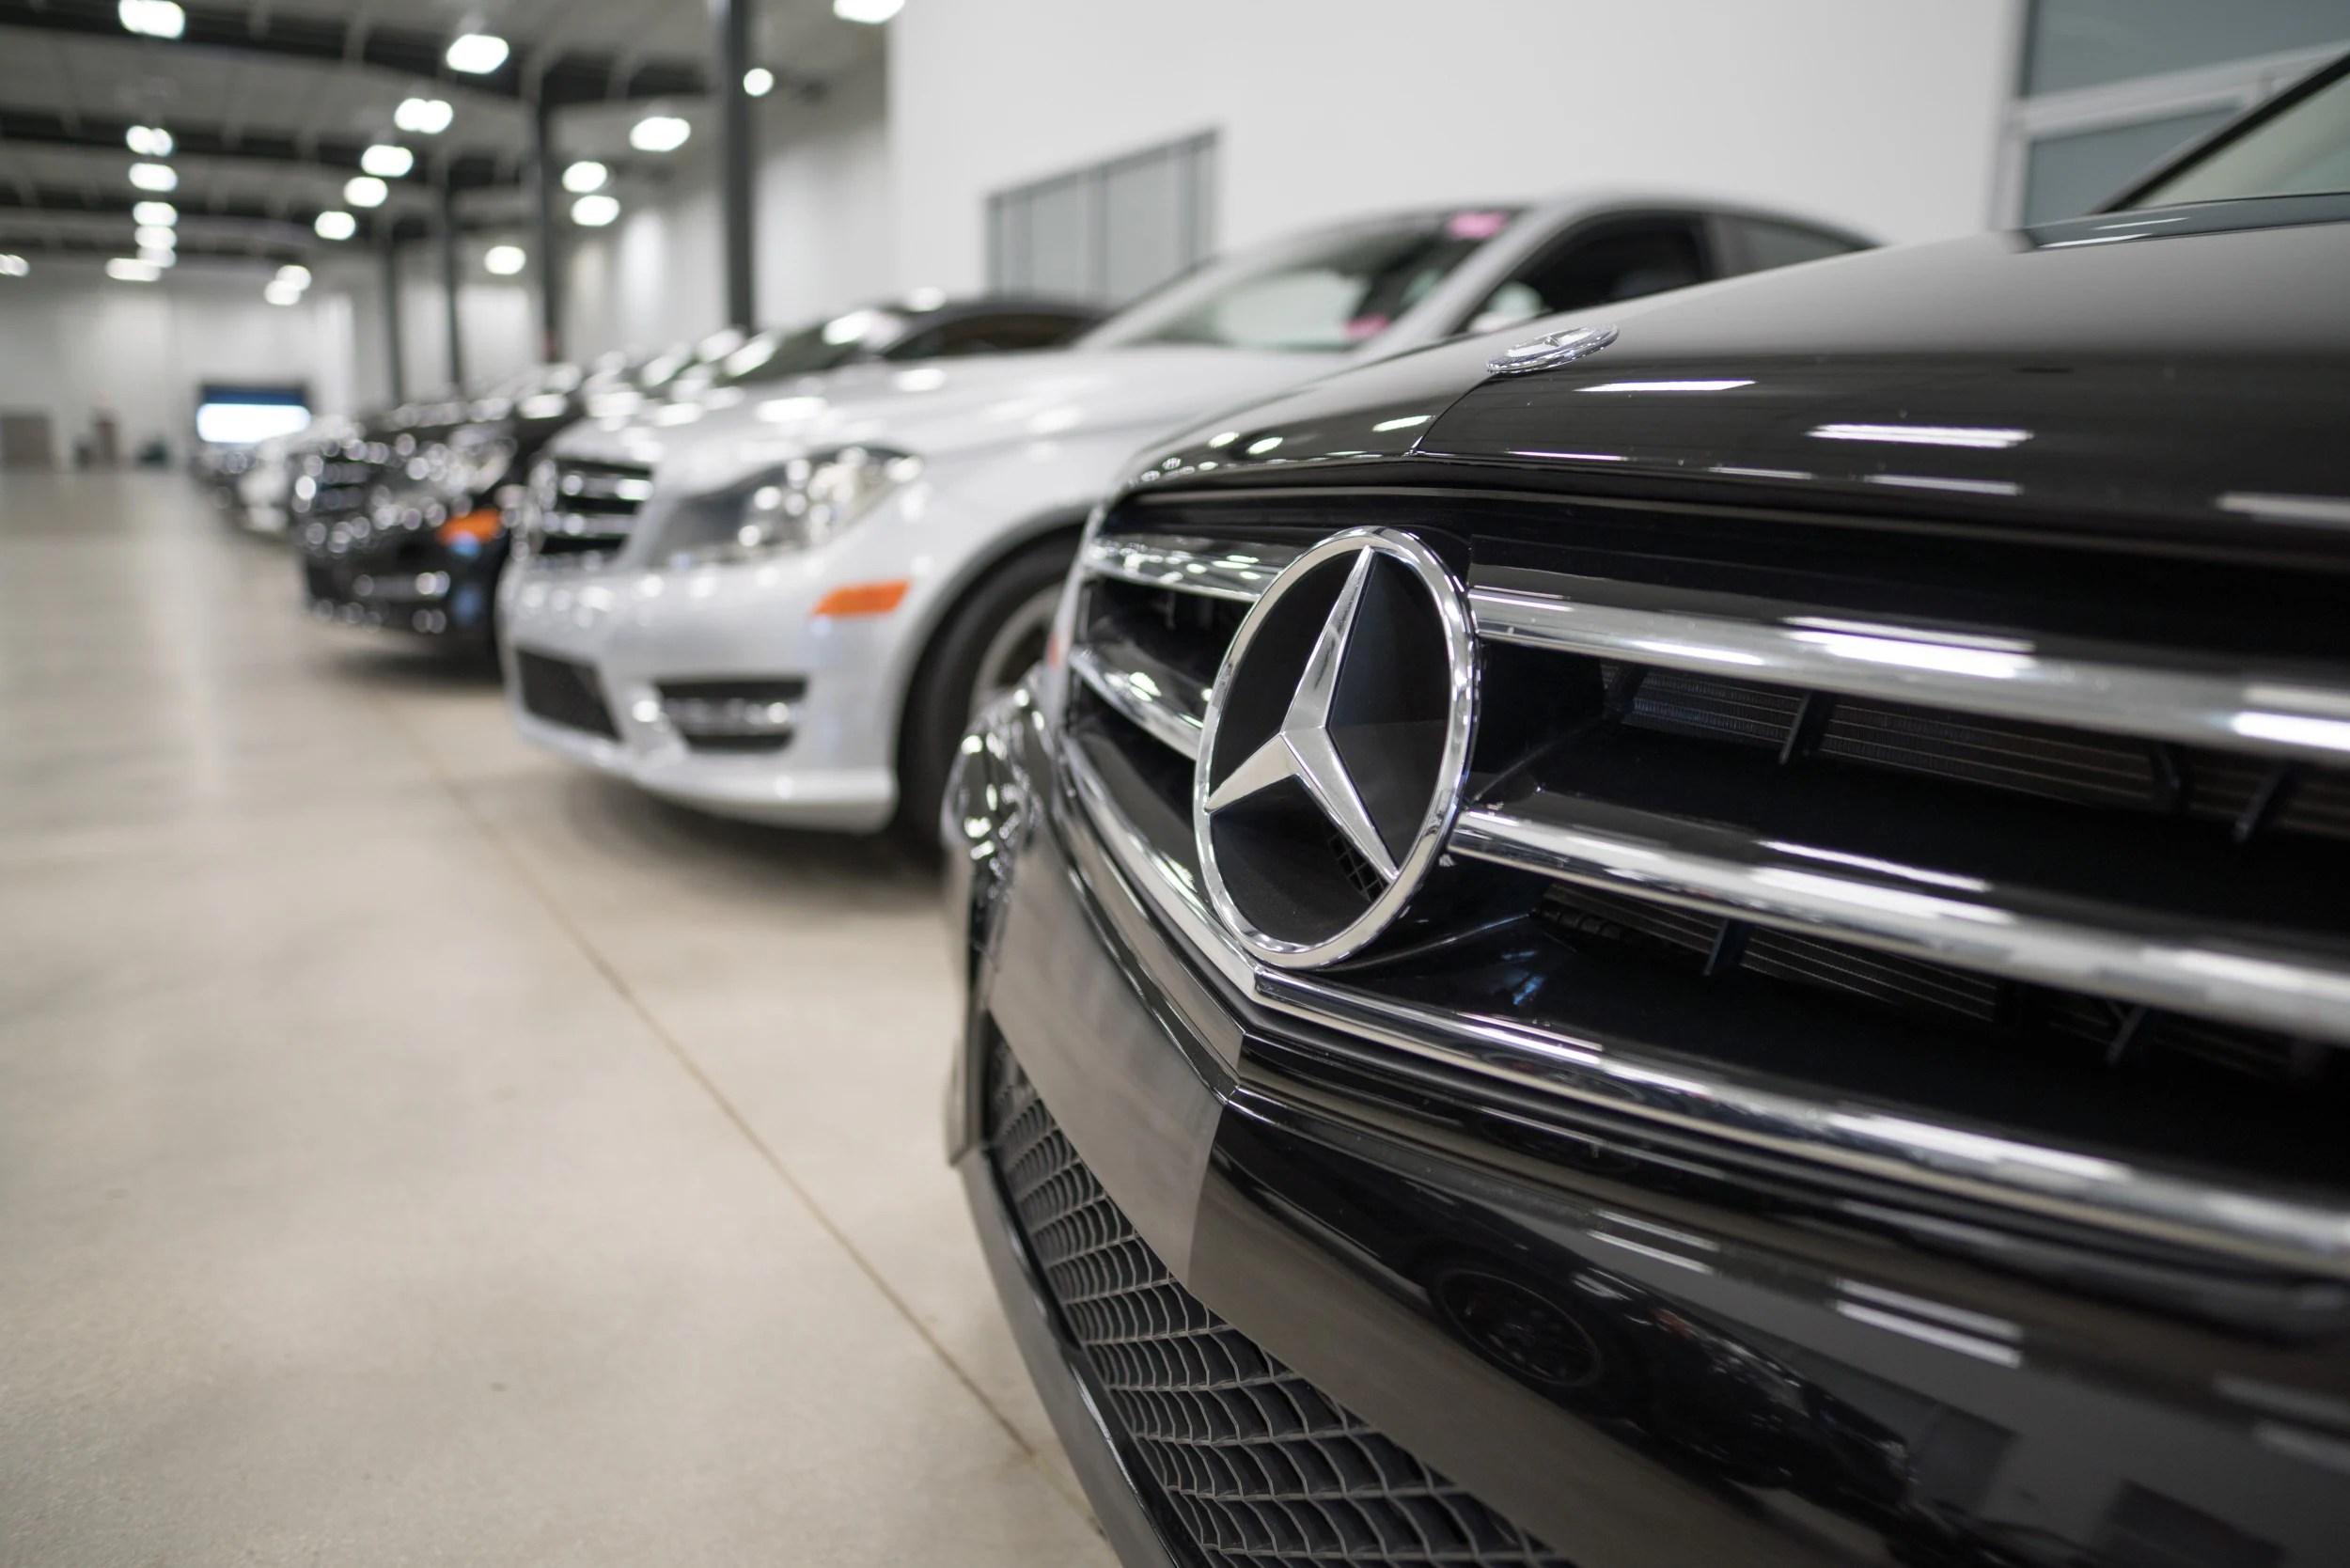 Mercedes Benz Dealership Near Me Houston TX